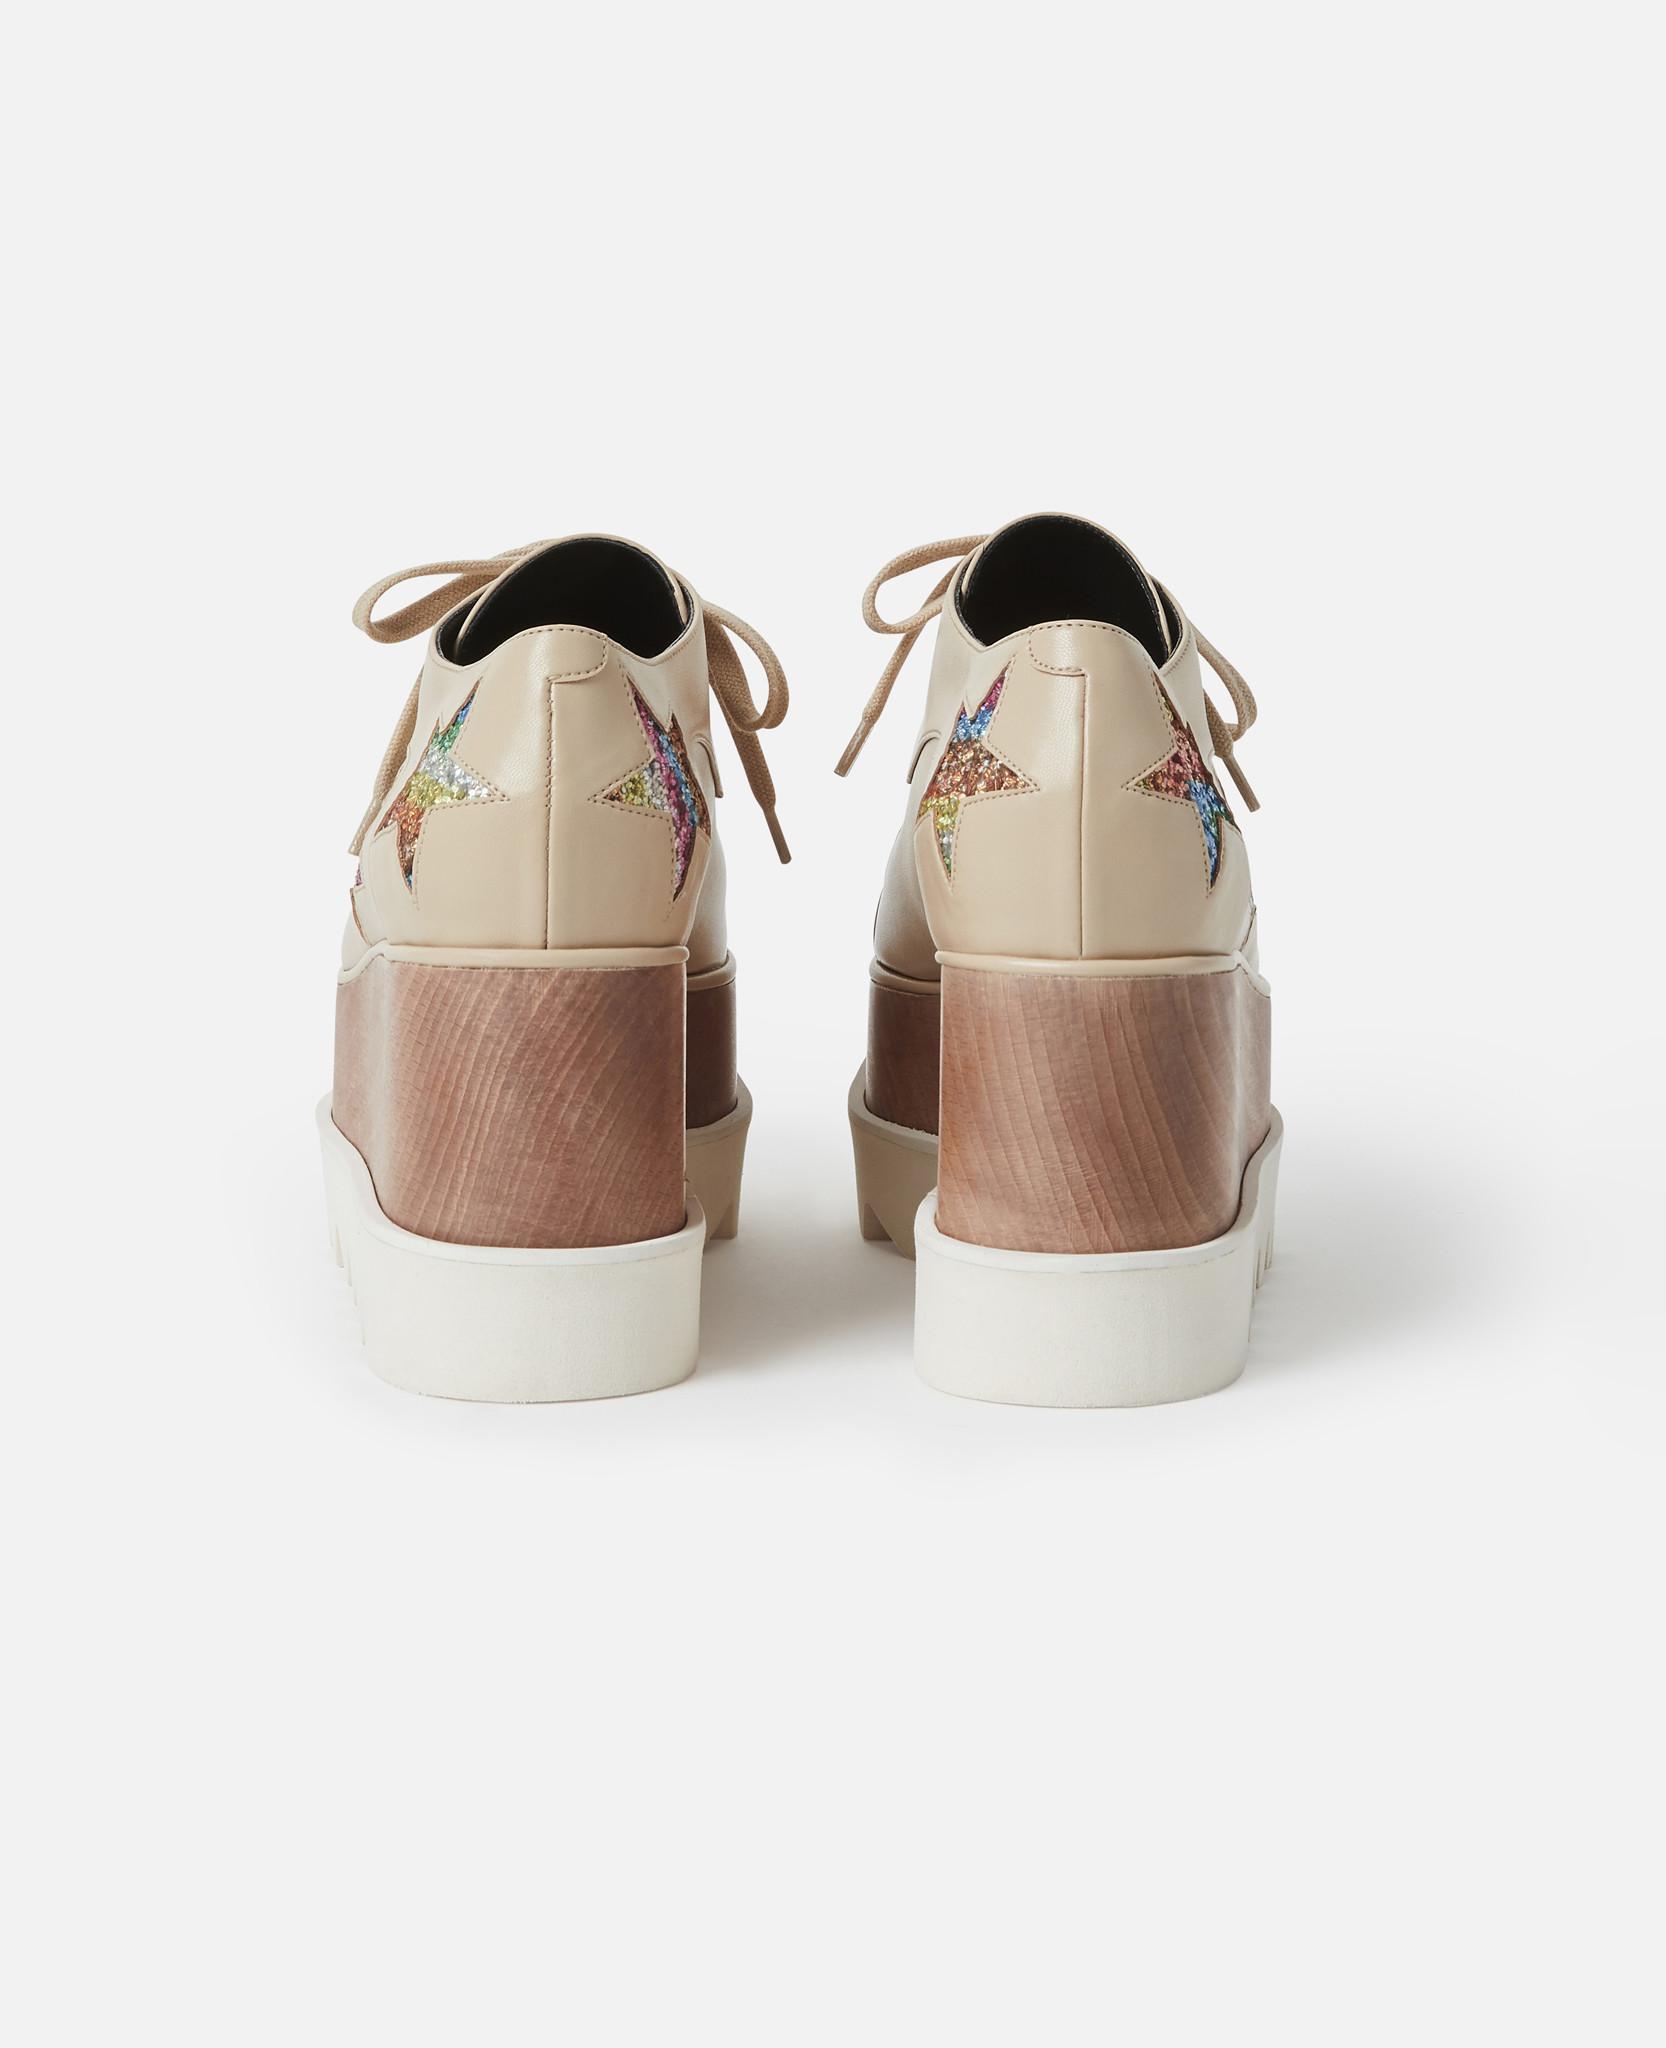 312b180be8ea Stella Mccartney Elyse Beige Shoes in Natural - Lyst